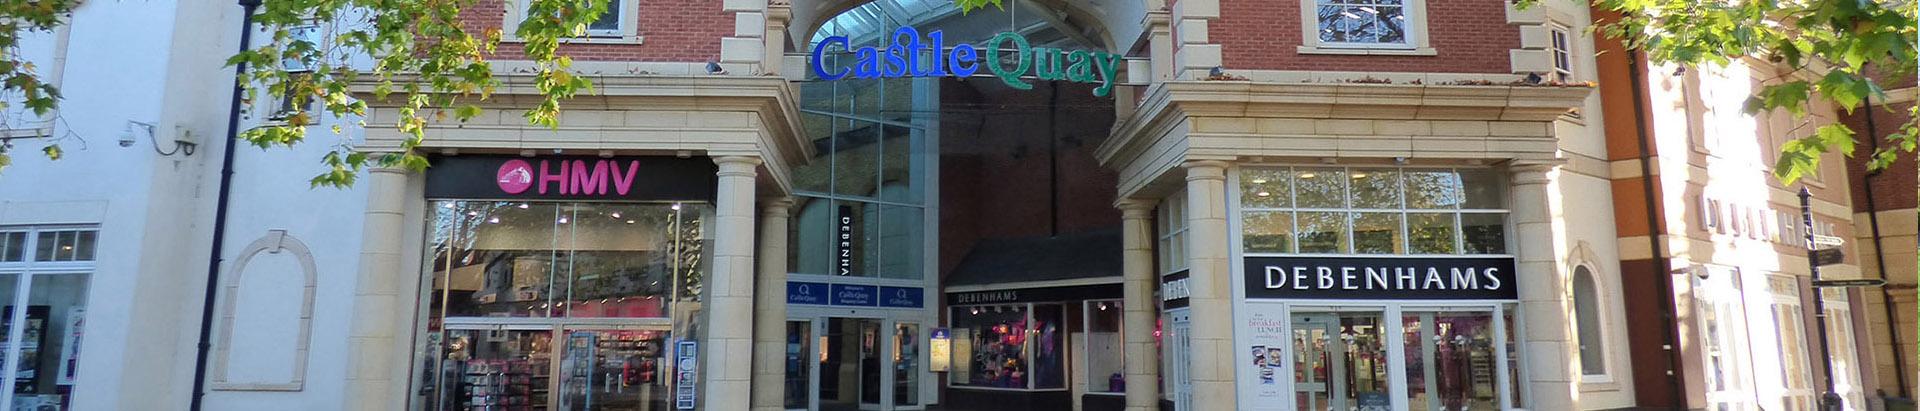 shoppingcentre